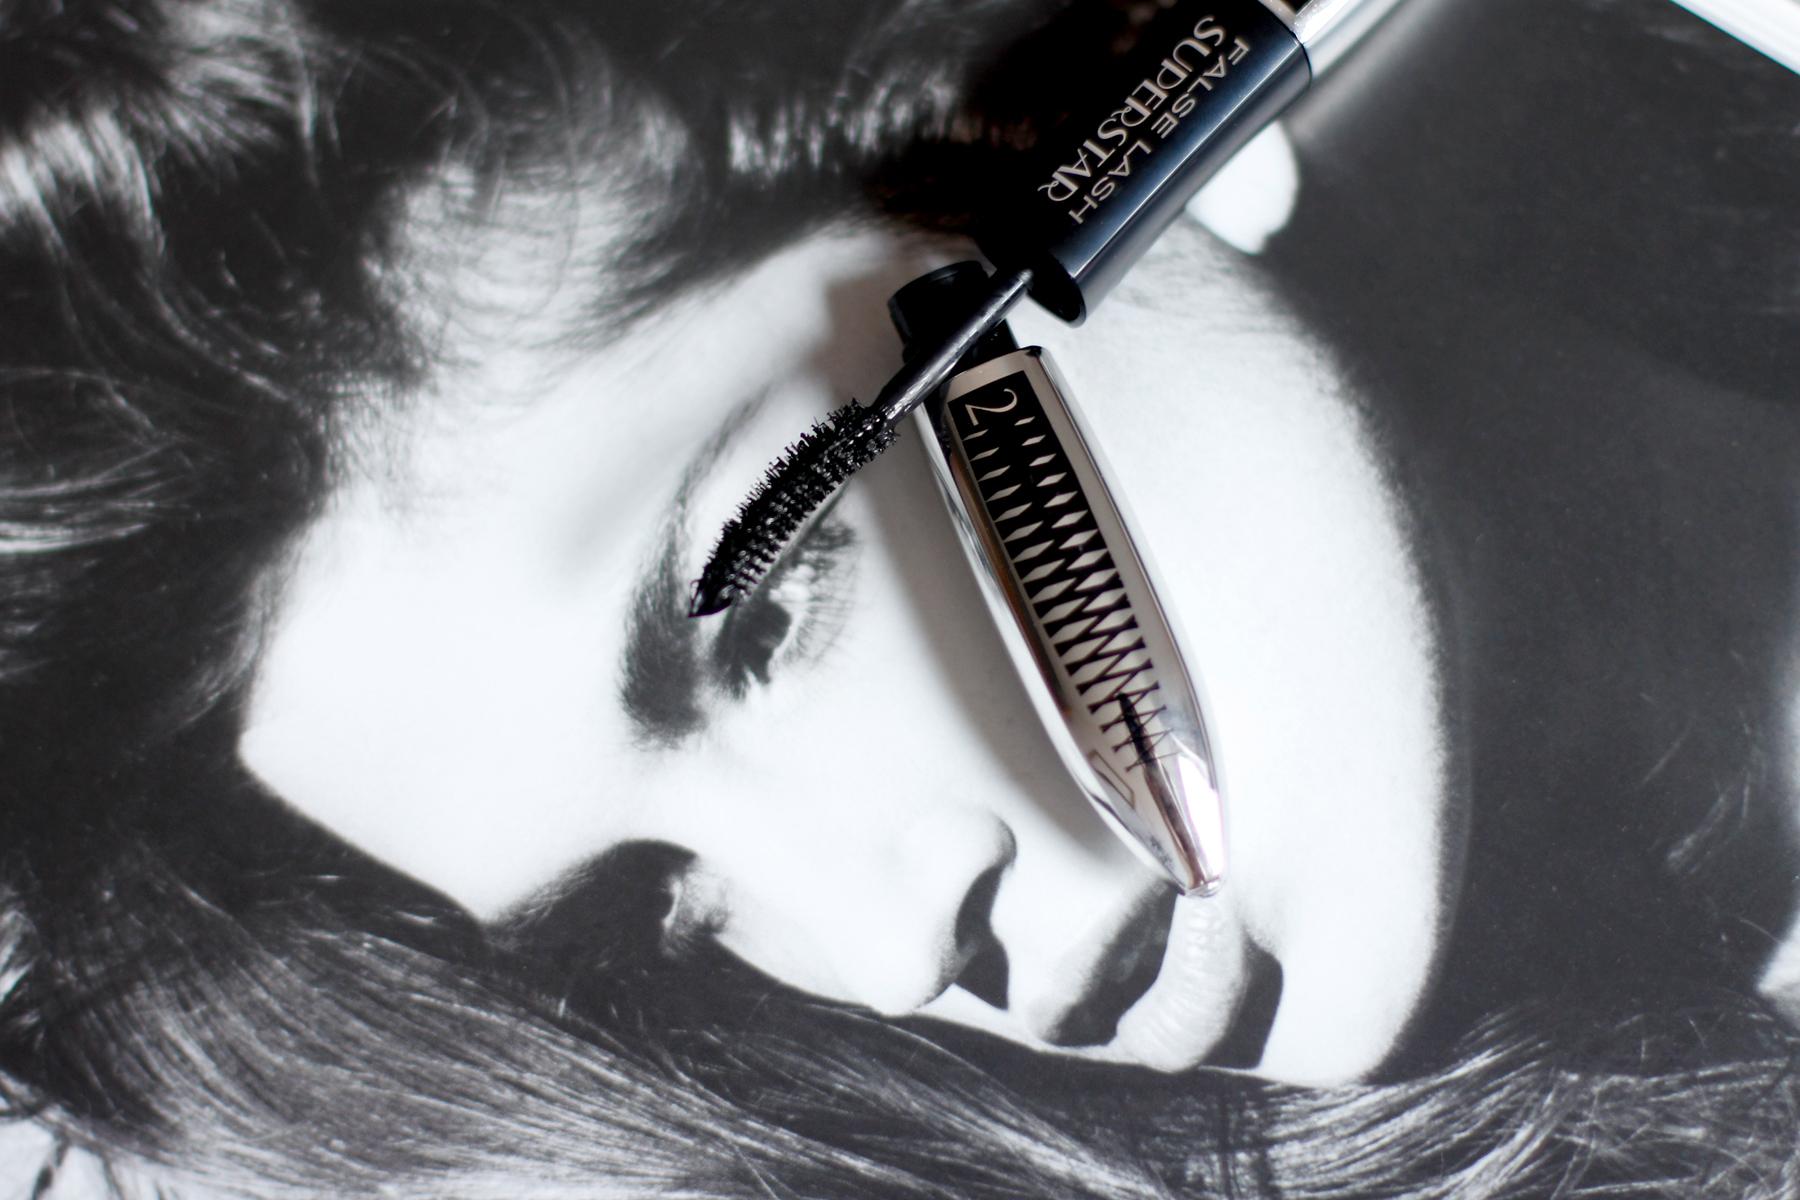 nude look beauty favorites summer 2015 shiseido l'oreal m.a.c. douglas beautyblogger ricarda schernus düsseldorf berlin 1